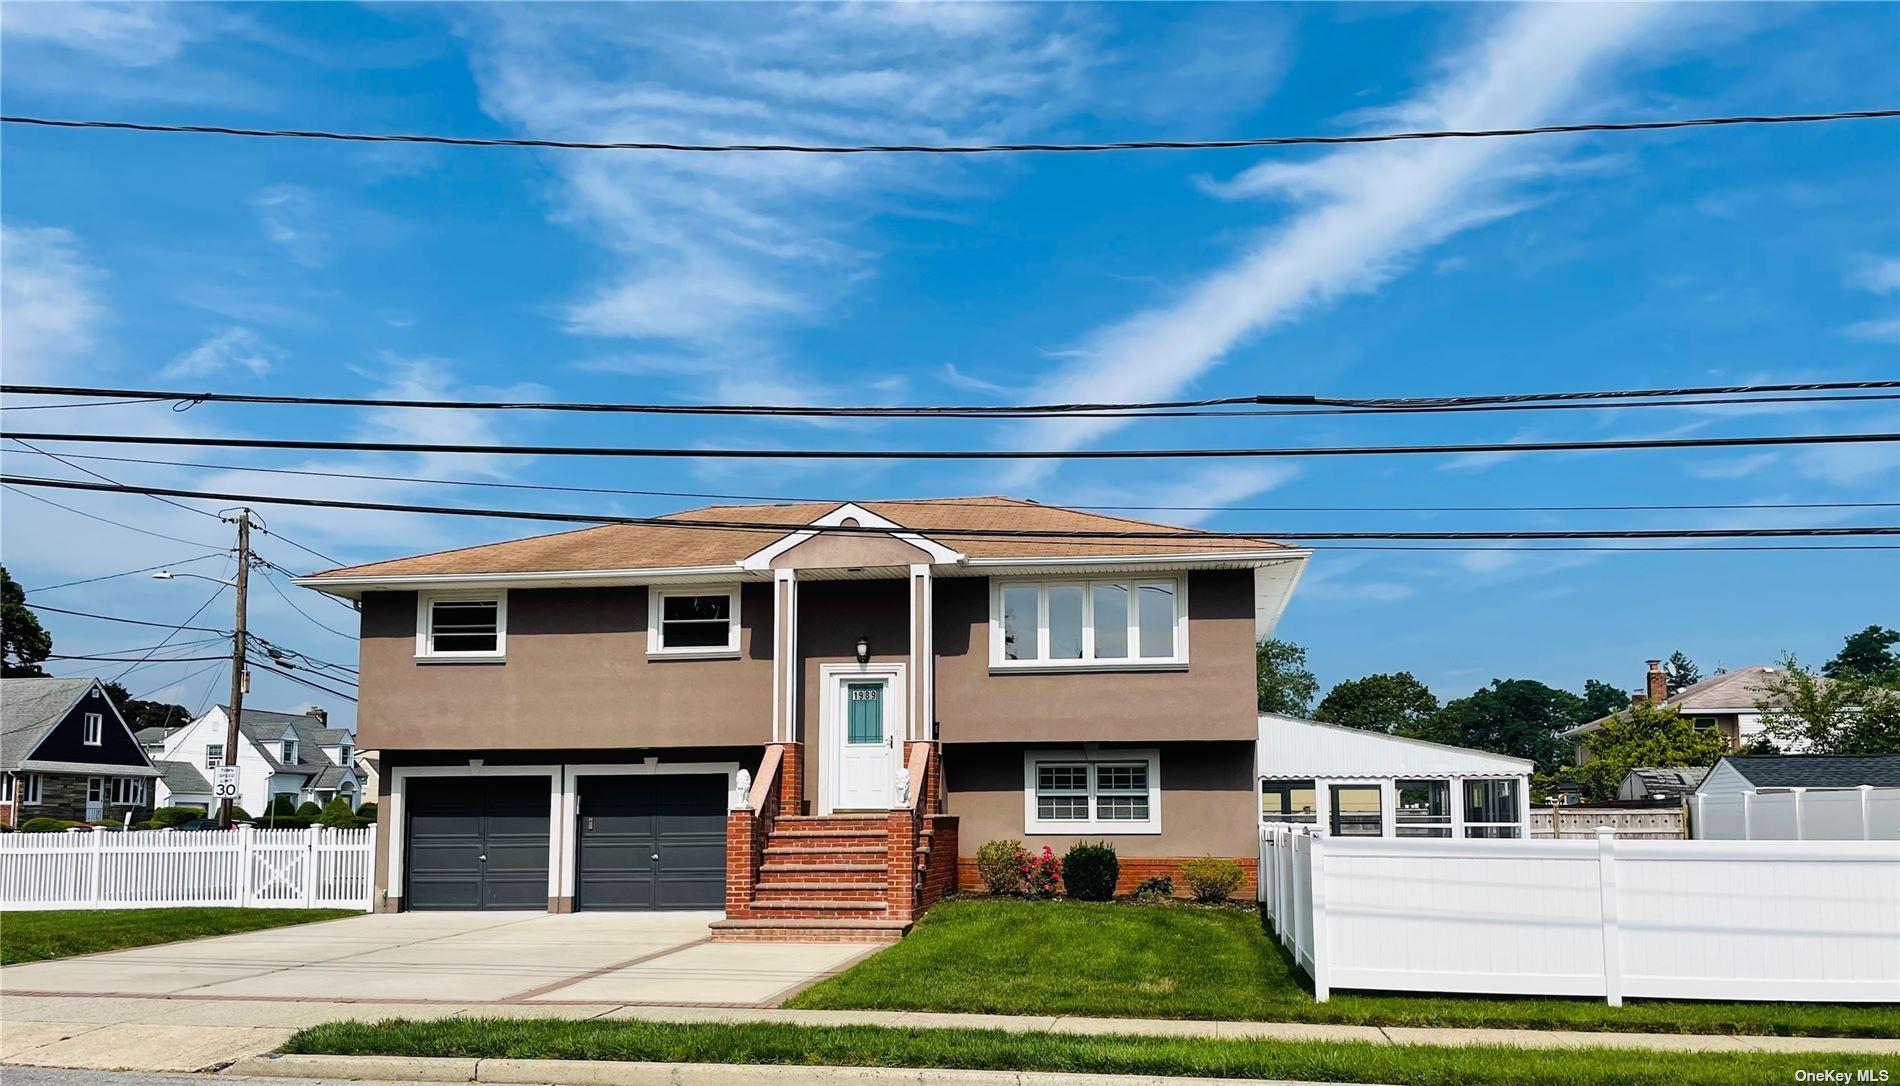 1989 Seamans Neck Rd, Seaford, NY 11783 - MLS#: 3330889